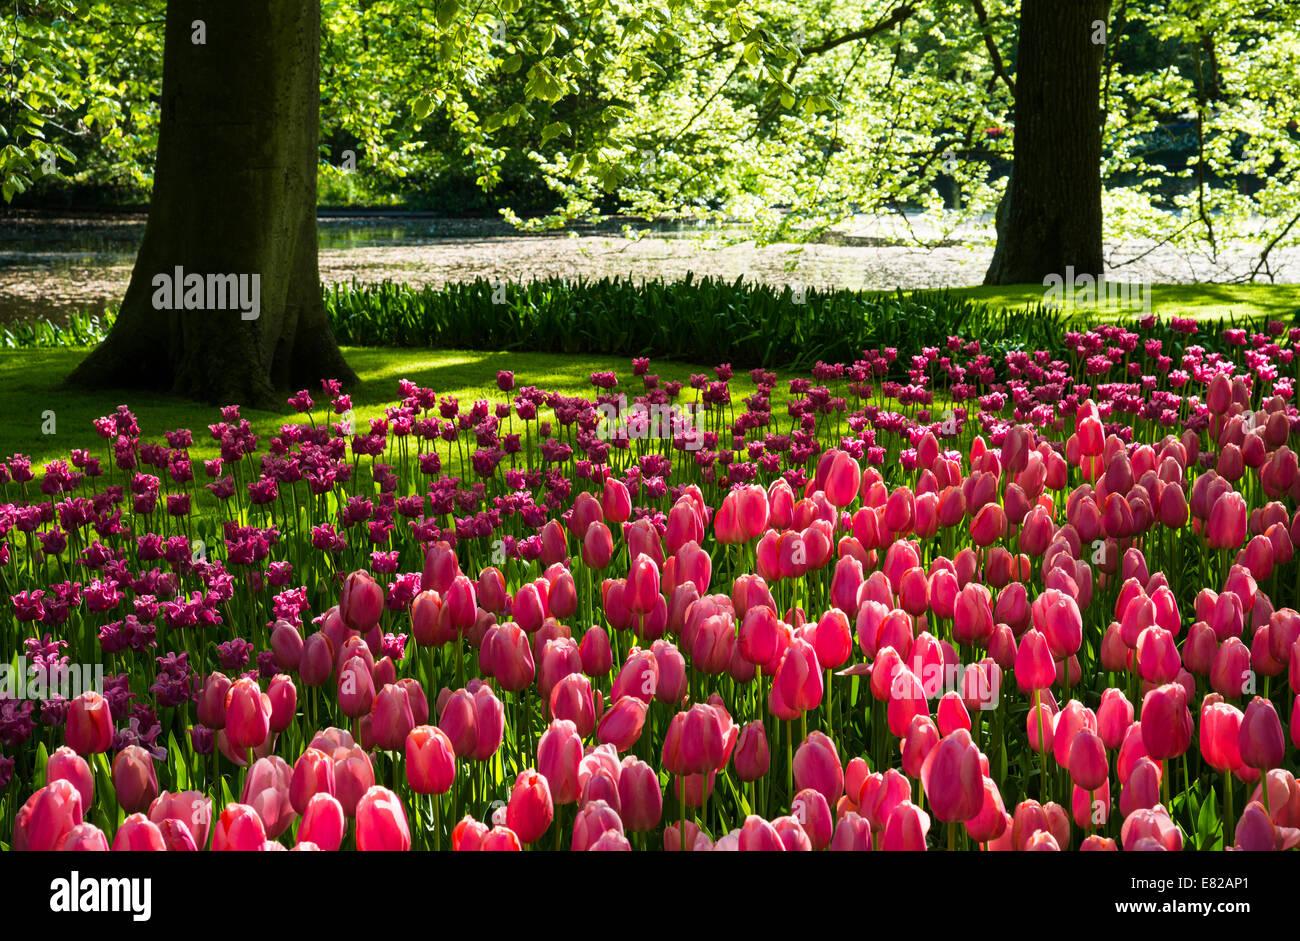 Tulips at Keukenhof Gardens, Duin- en Bollenstreek, the Netherlands - Stock Image